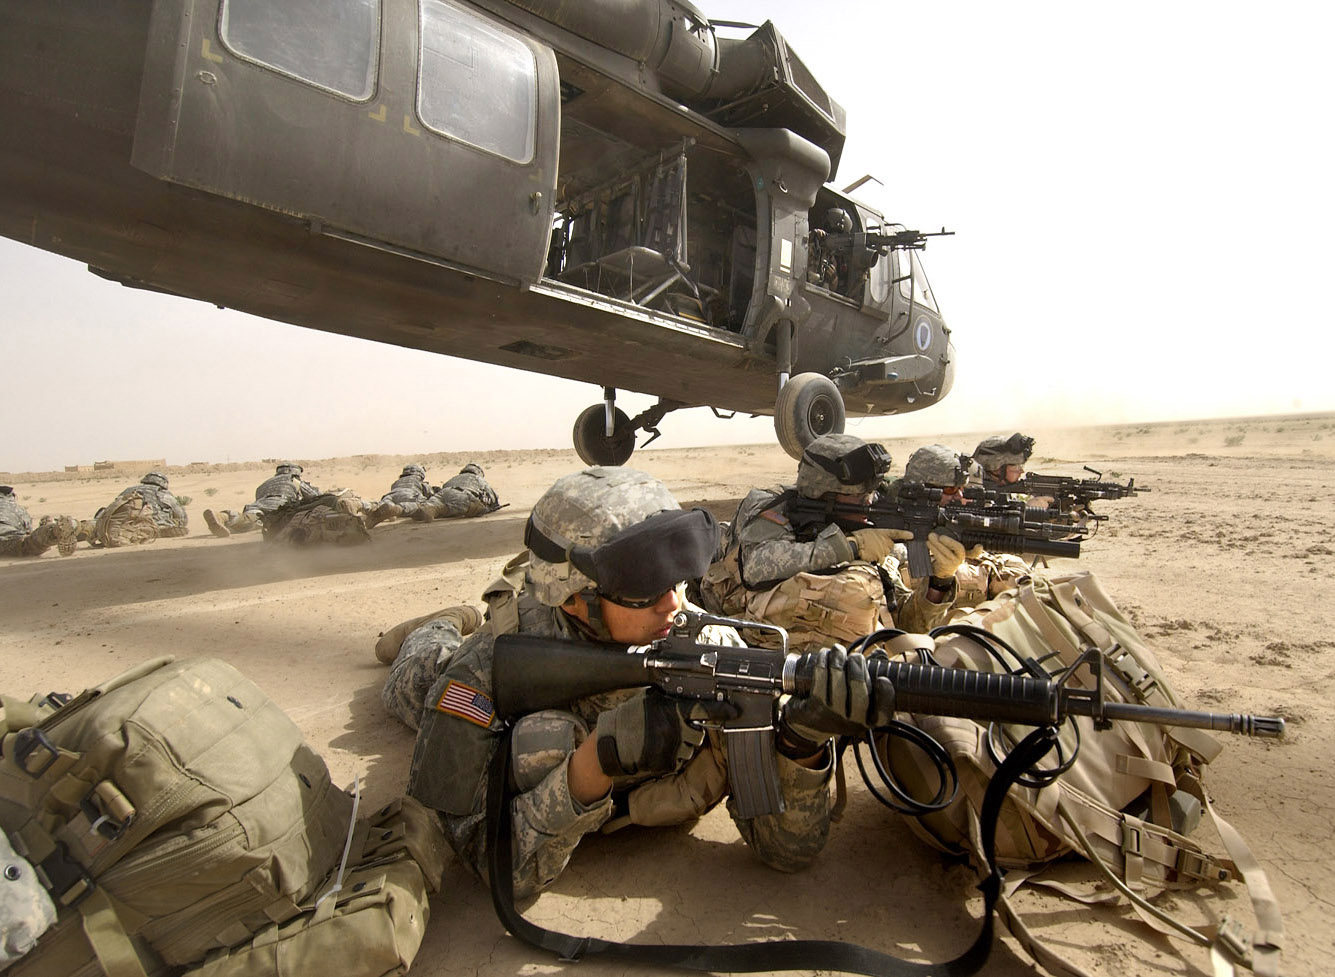 1st_Armored_Division_dismount_a_UH-60_Blackhawk.jpg